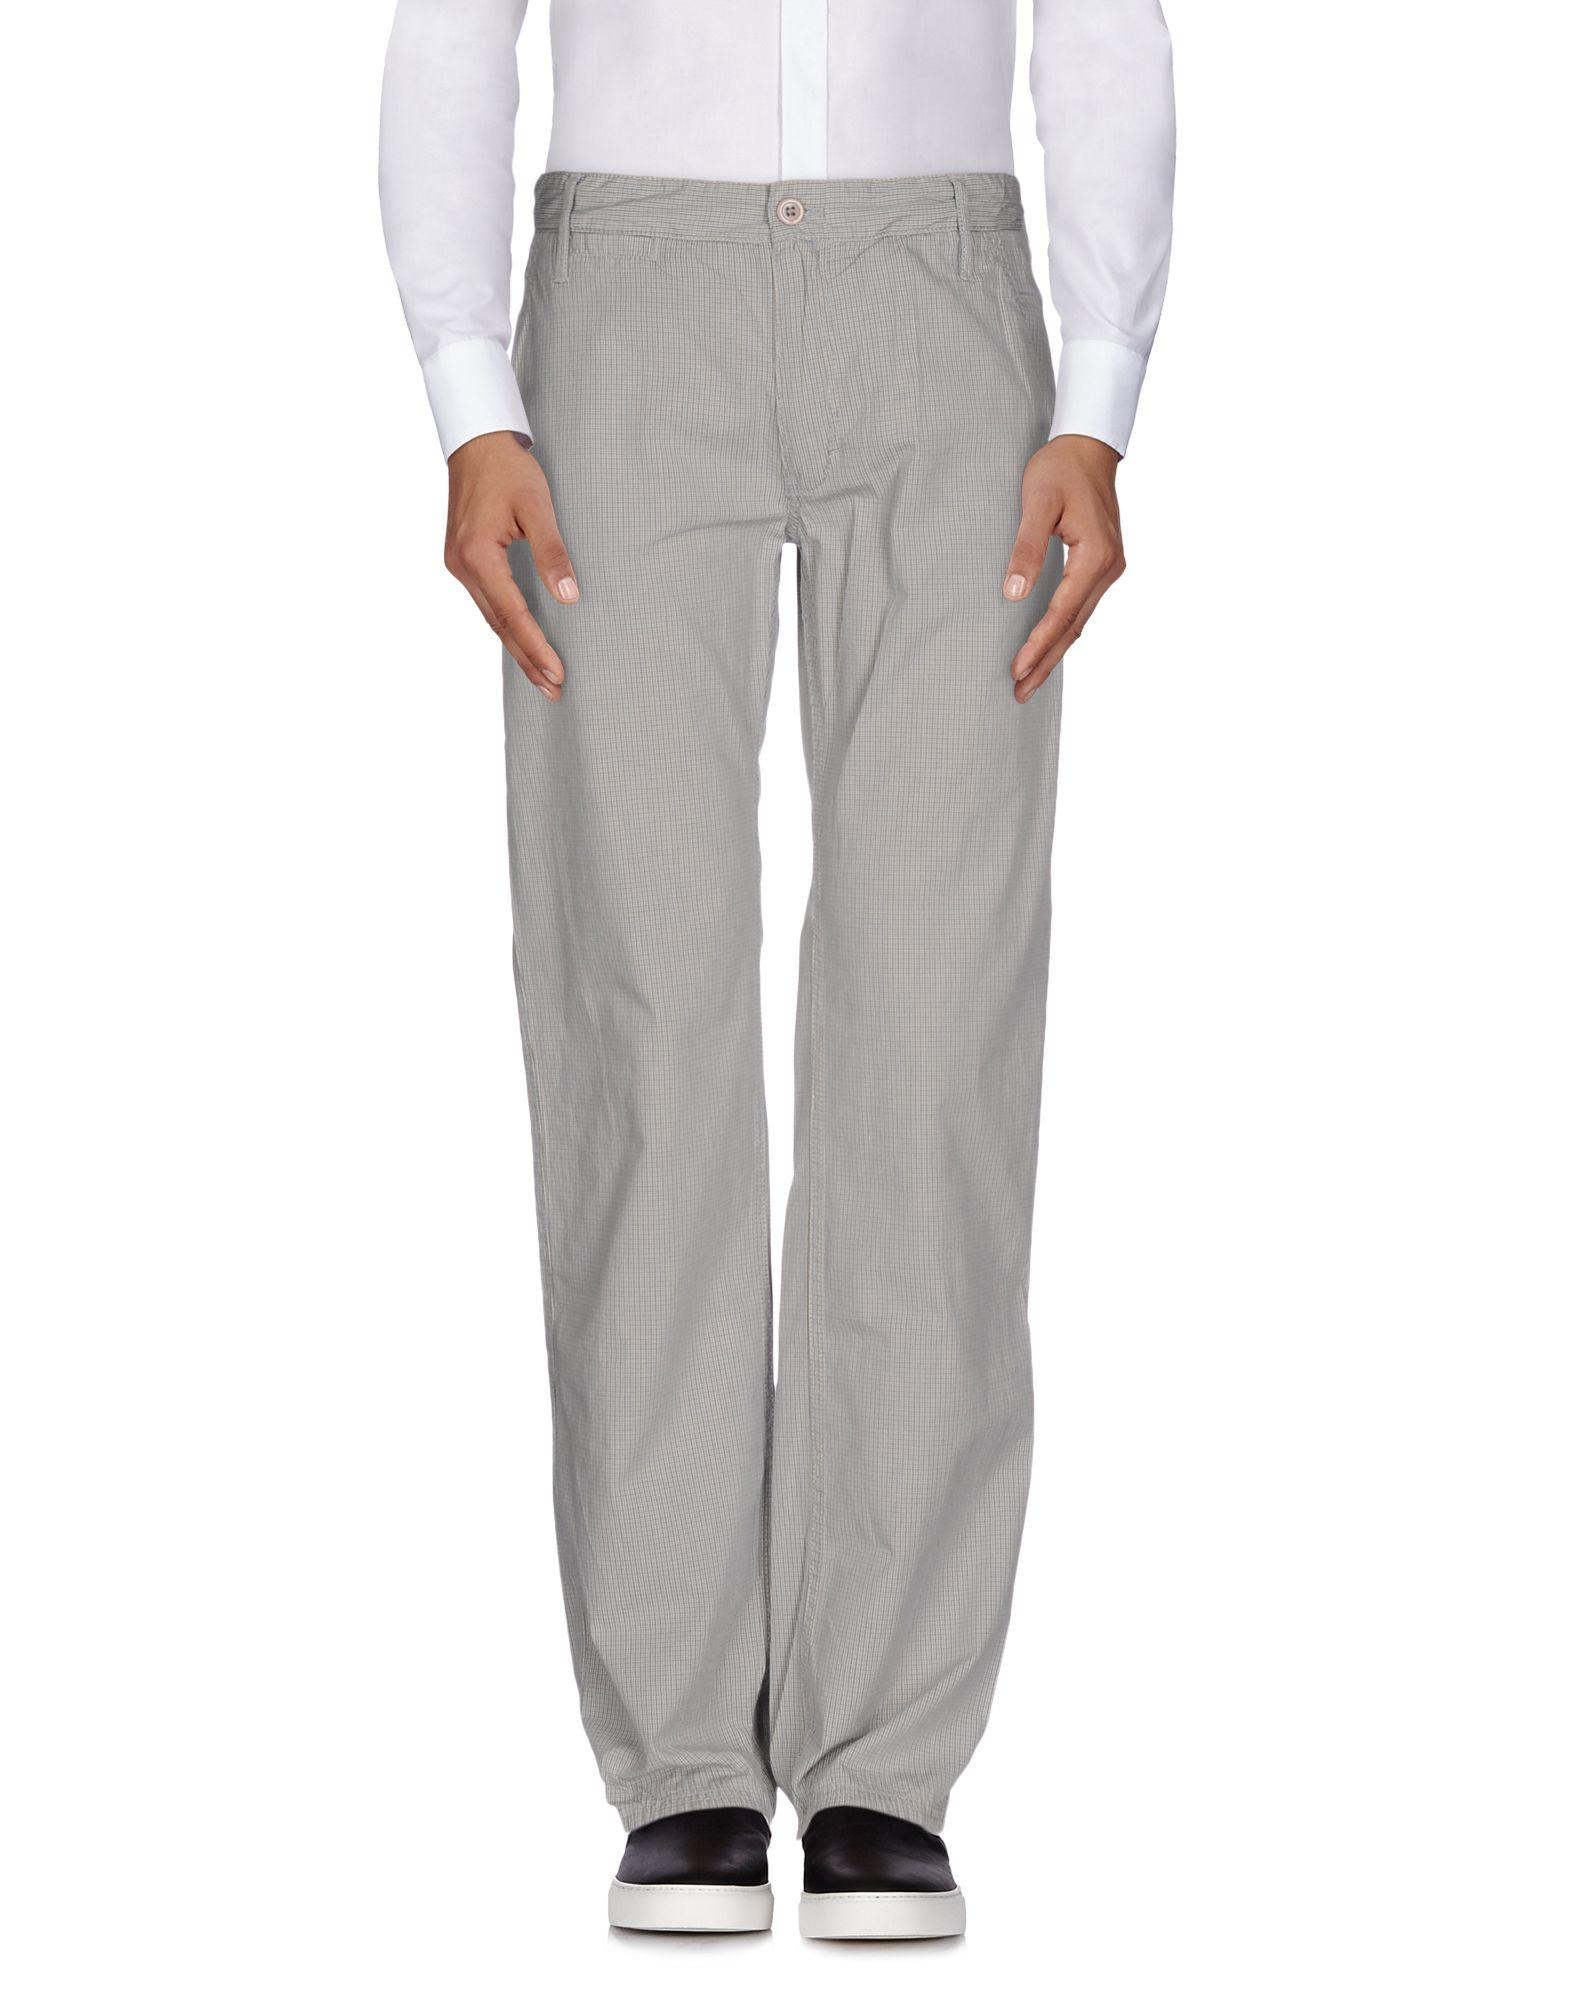 PEPE JEANS 73 Повседневные брюки pepe jeans повседневные брюки